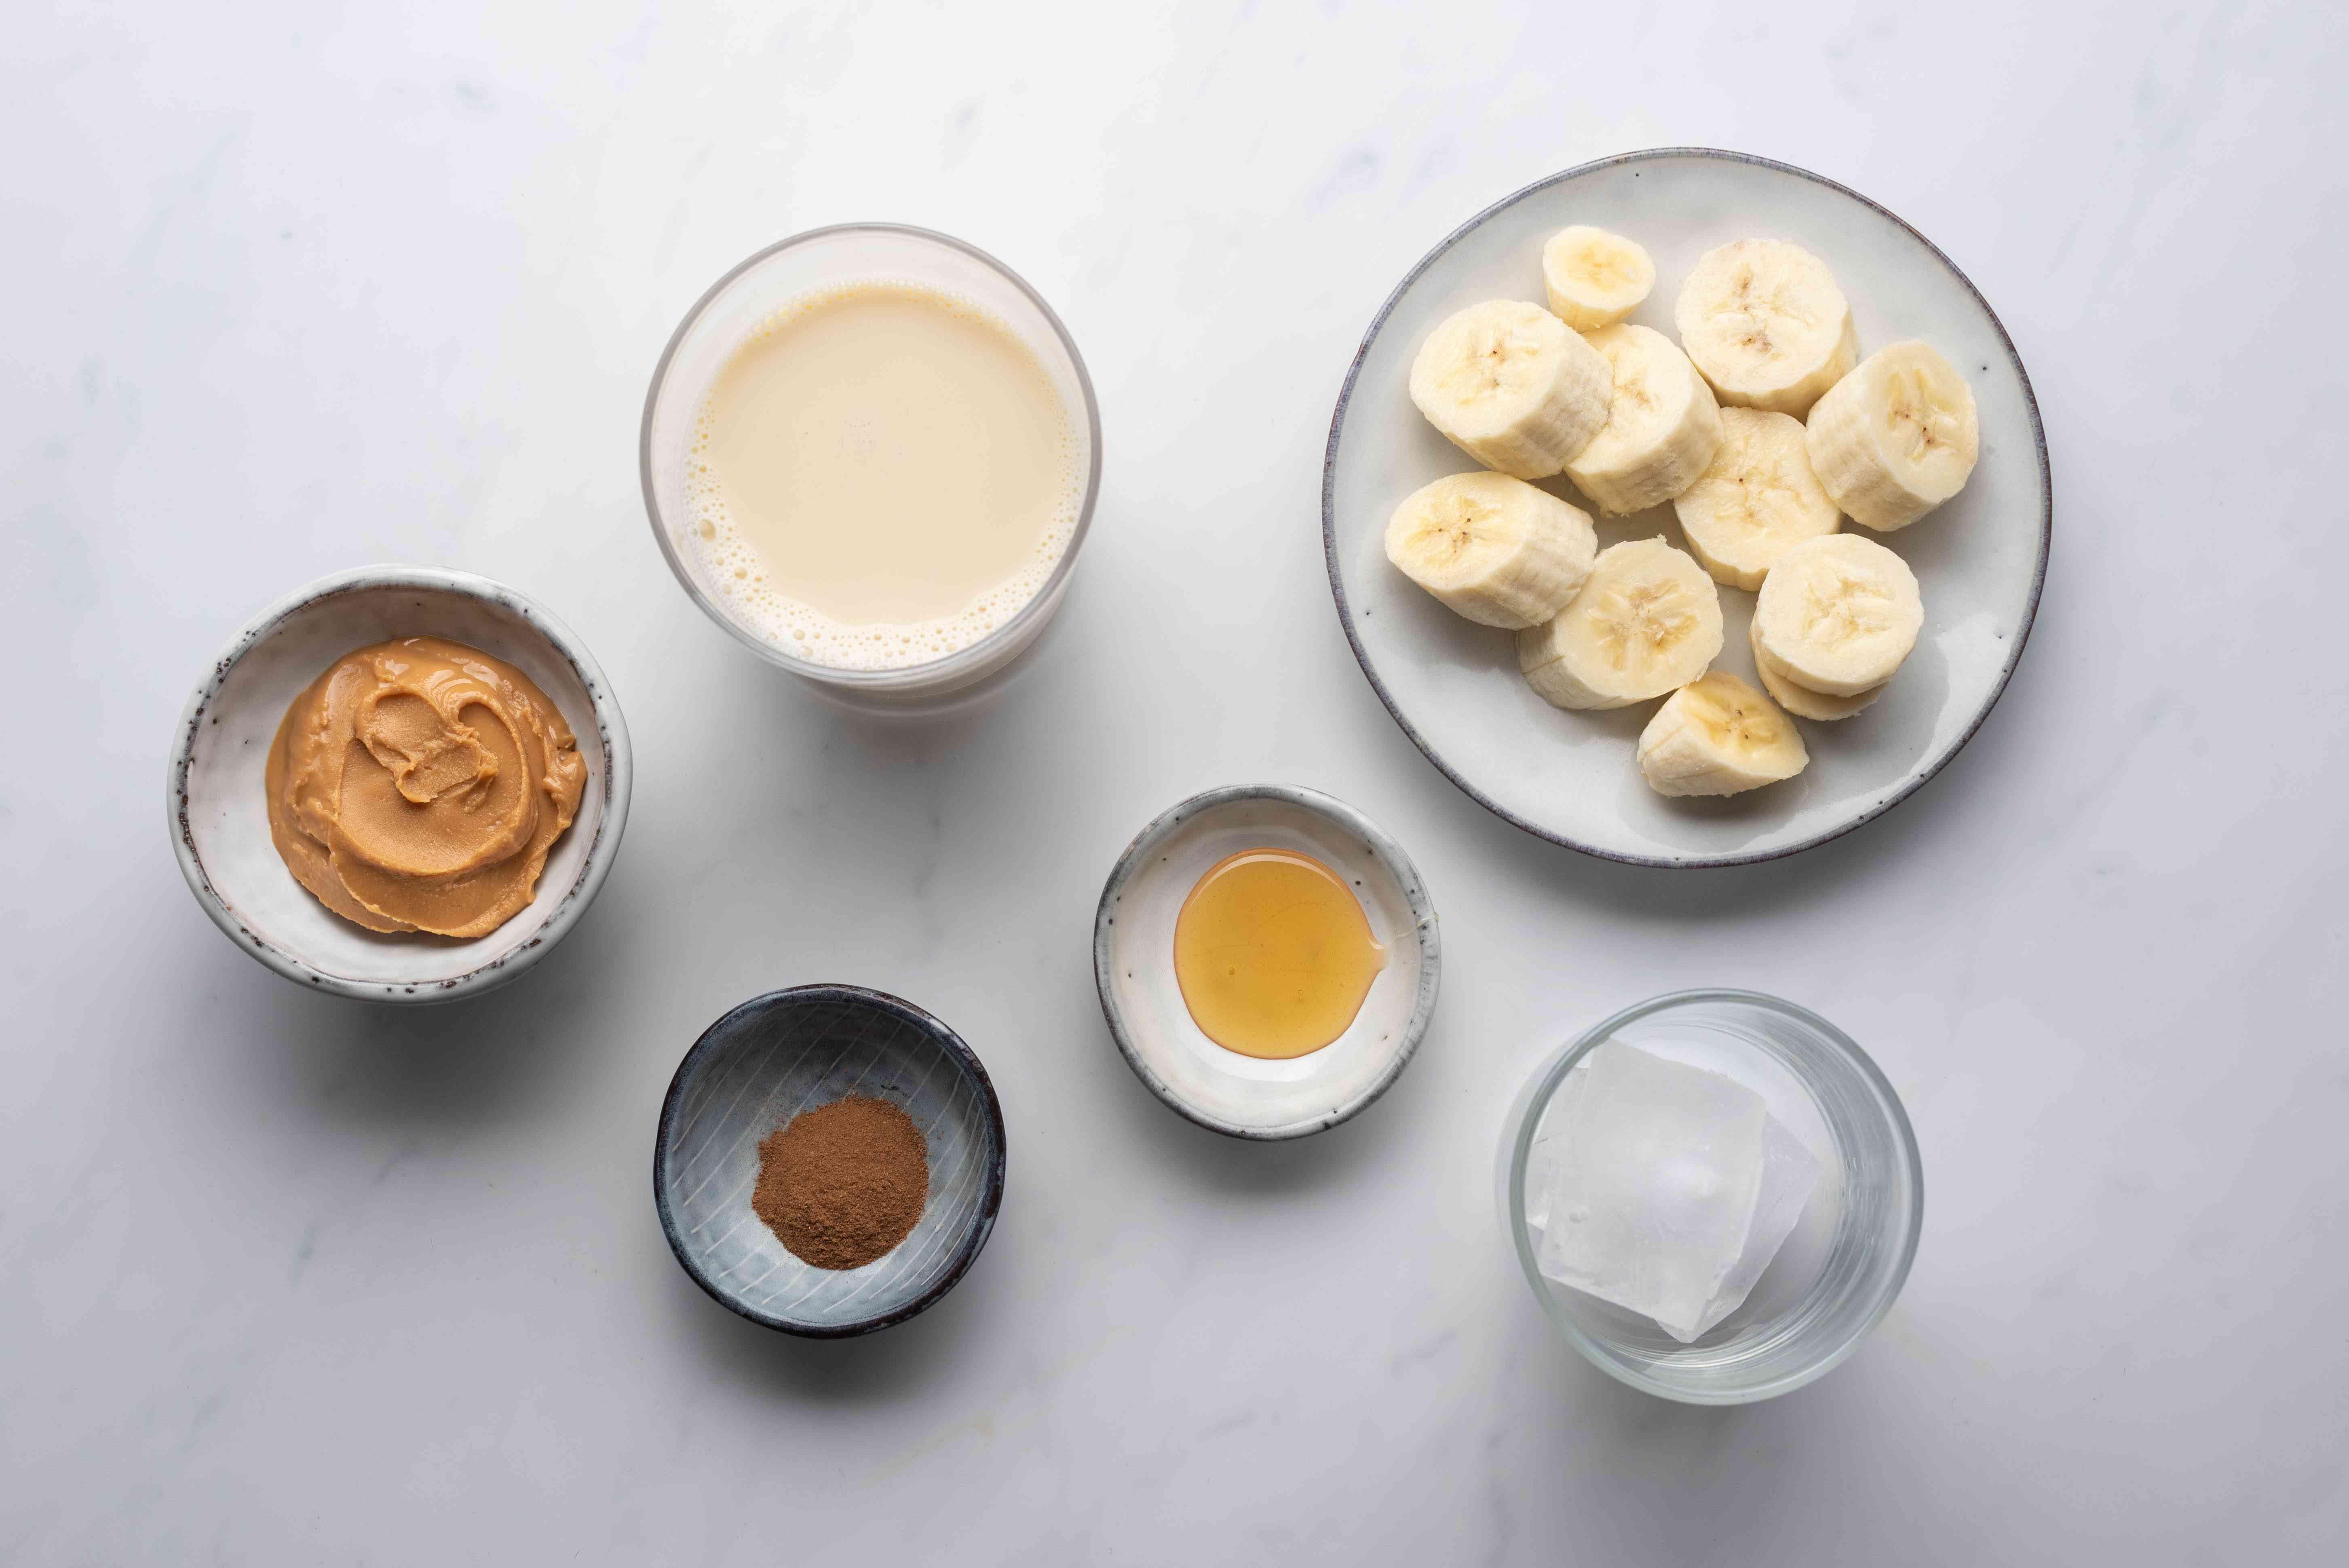 Peanut Banana Cinnamon Smoothie ingredients